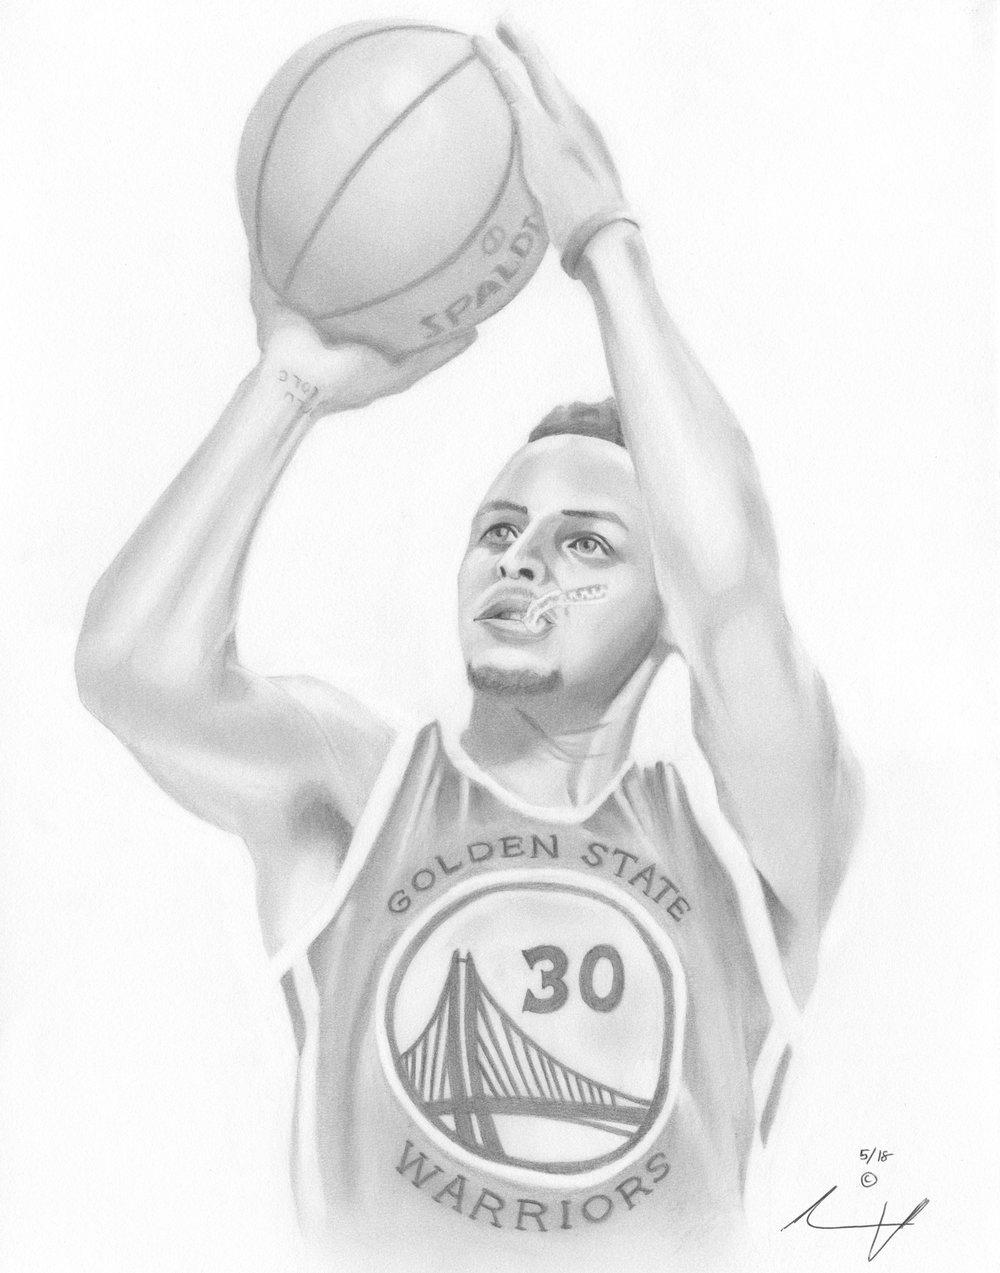 2018-05 Stephen Curry.jpg